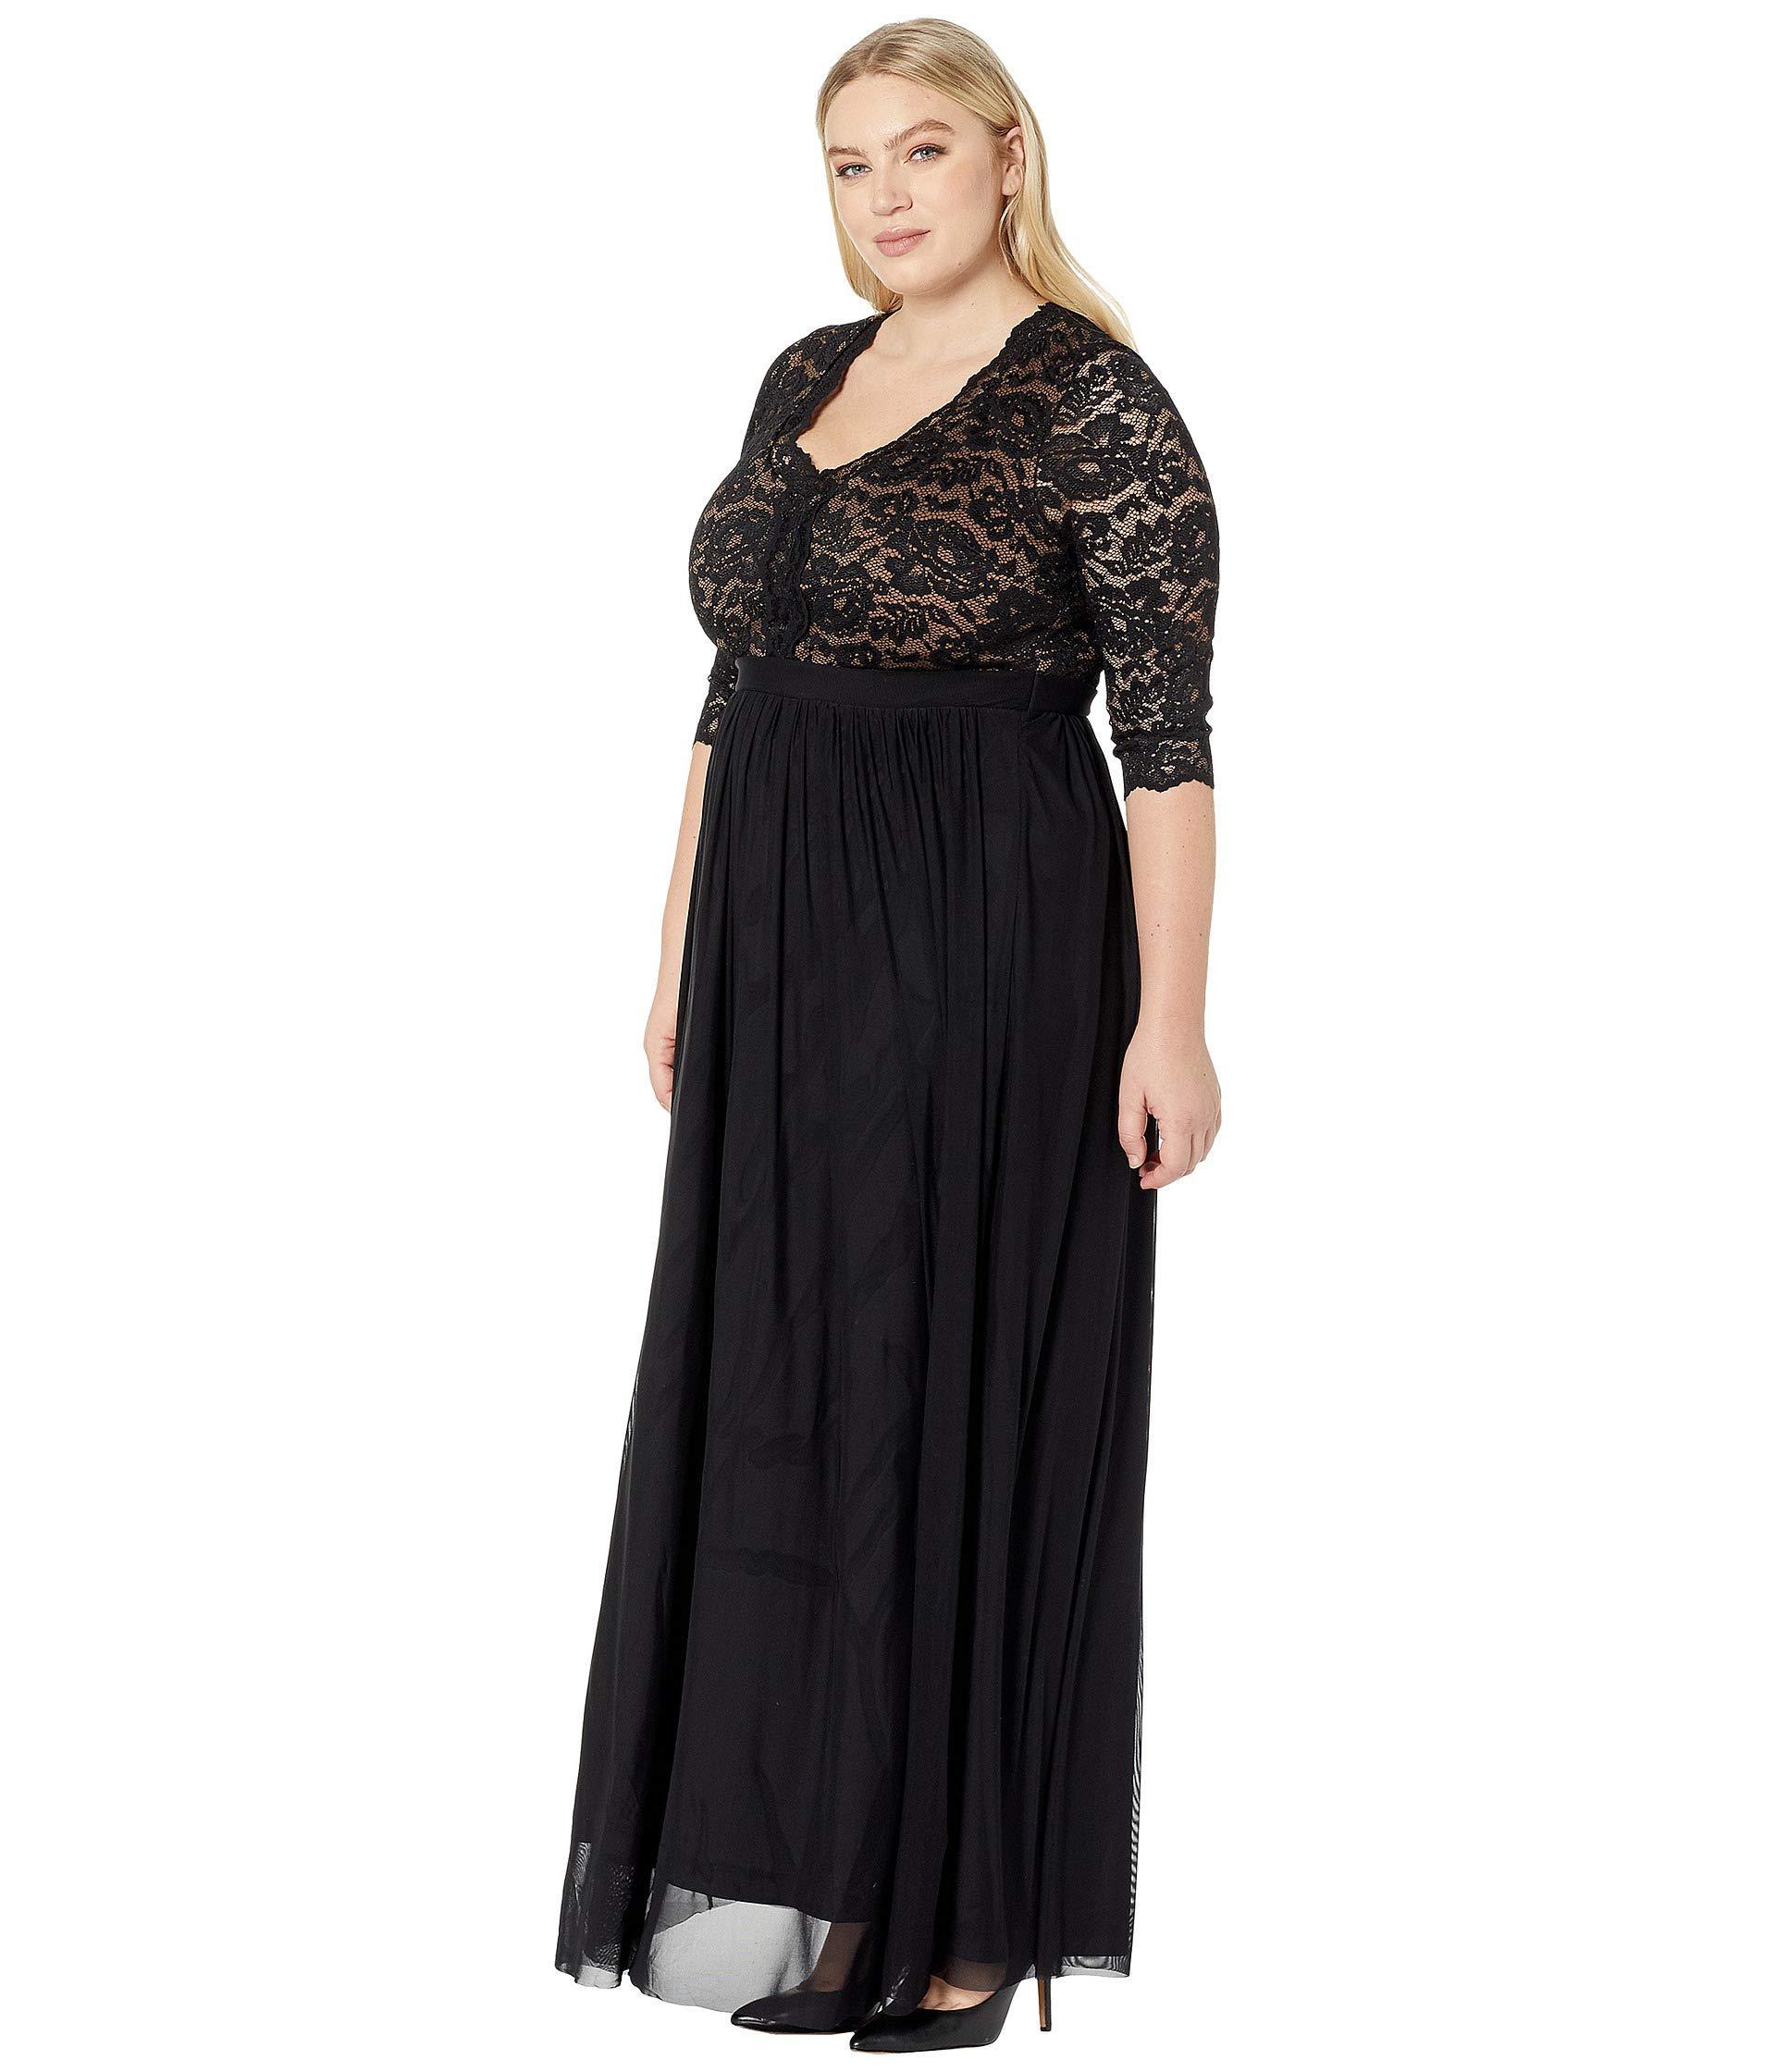 Onyx Evening Dresses